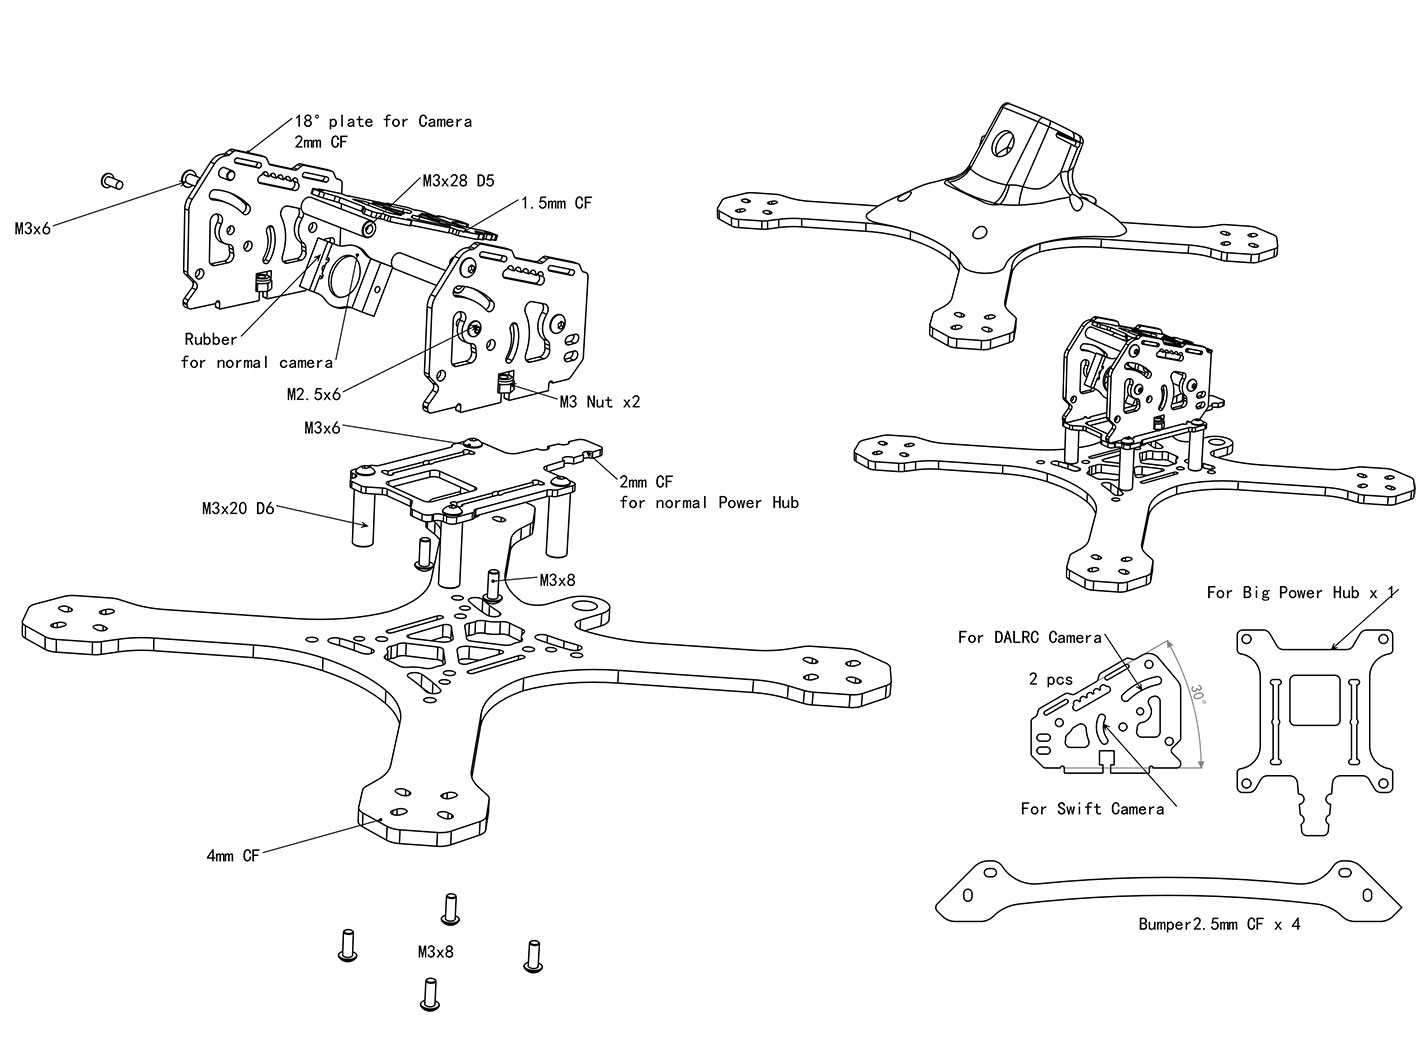 RJX часть X Speed XBR 220 FPV гоночный Дрон RC комплект Квадрокоптер разобранный мультиротор запчасти - 4